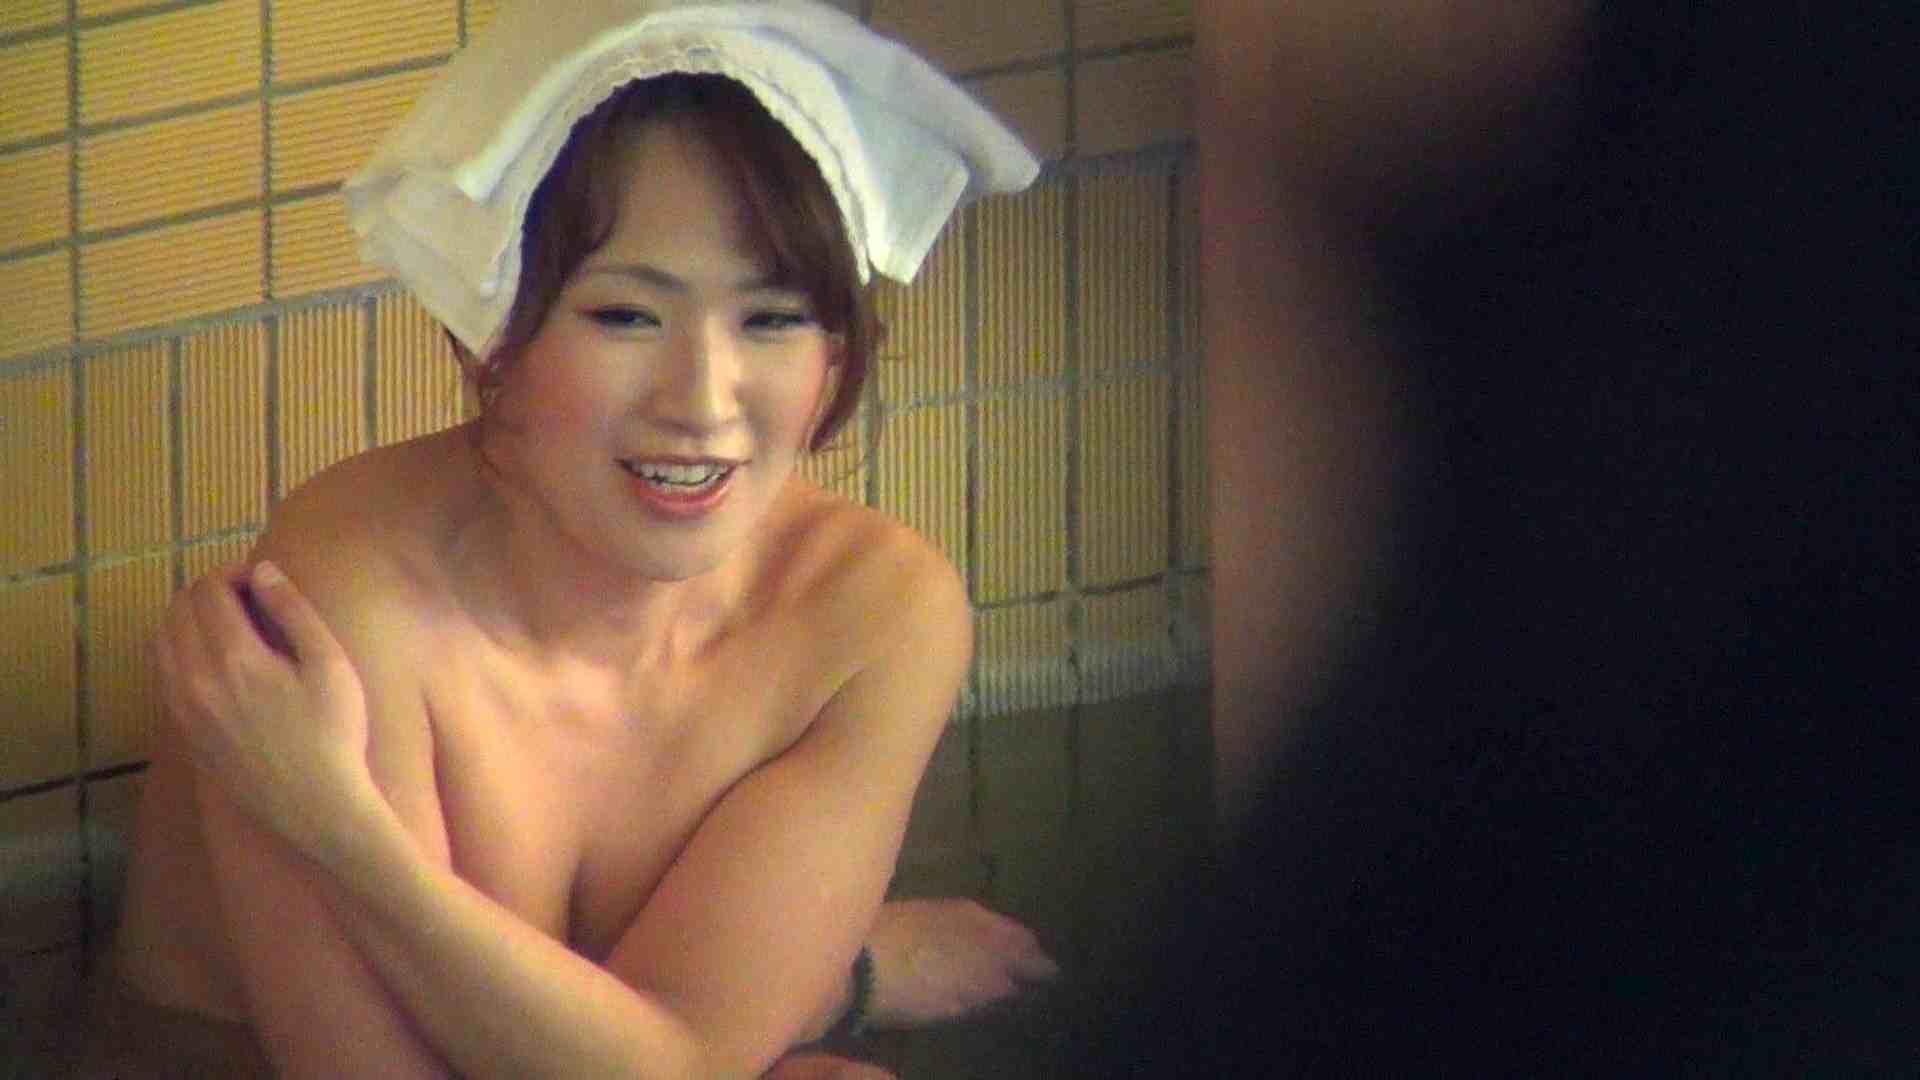 Aquaな露天風呂Vol.272 盗撮 われめAV動画紹介 99PICs 89